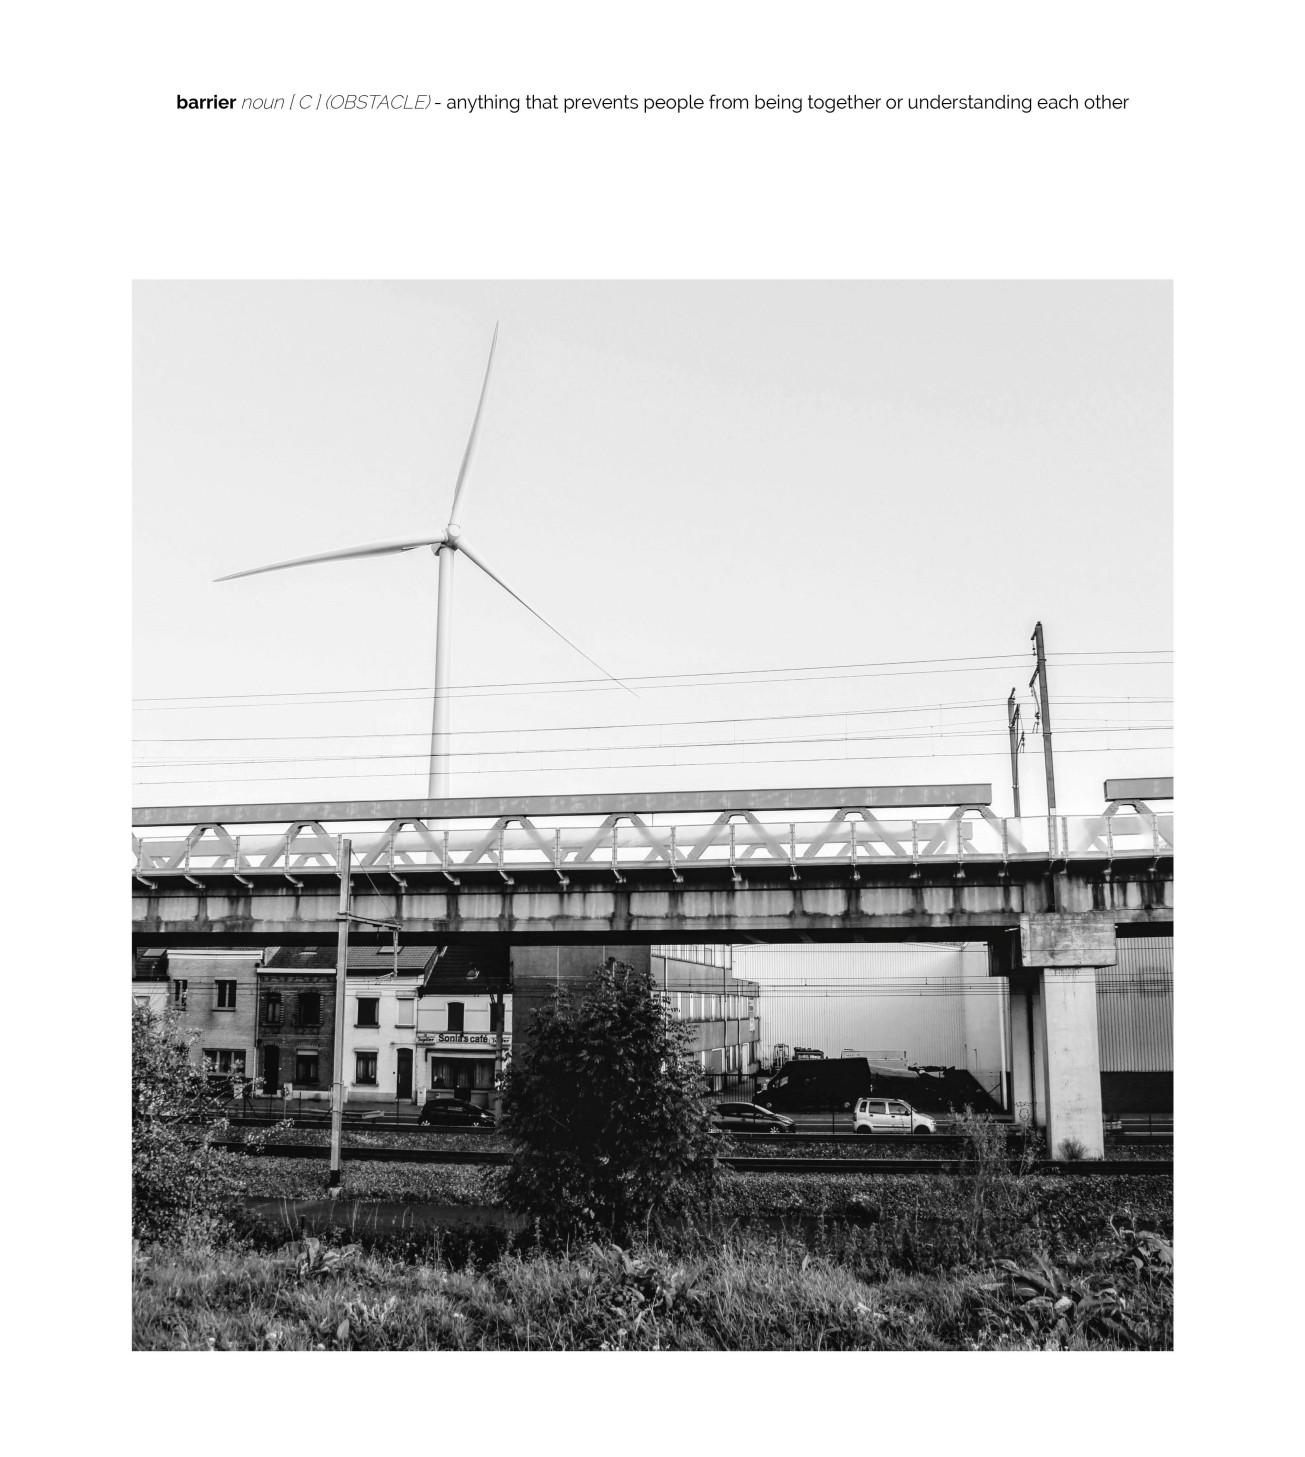 Atlas of Unexpected Spaces for Collectivity_Tomasz Bulczak_1st year_KU Leuven_15